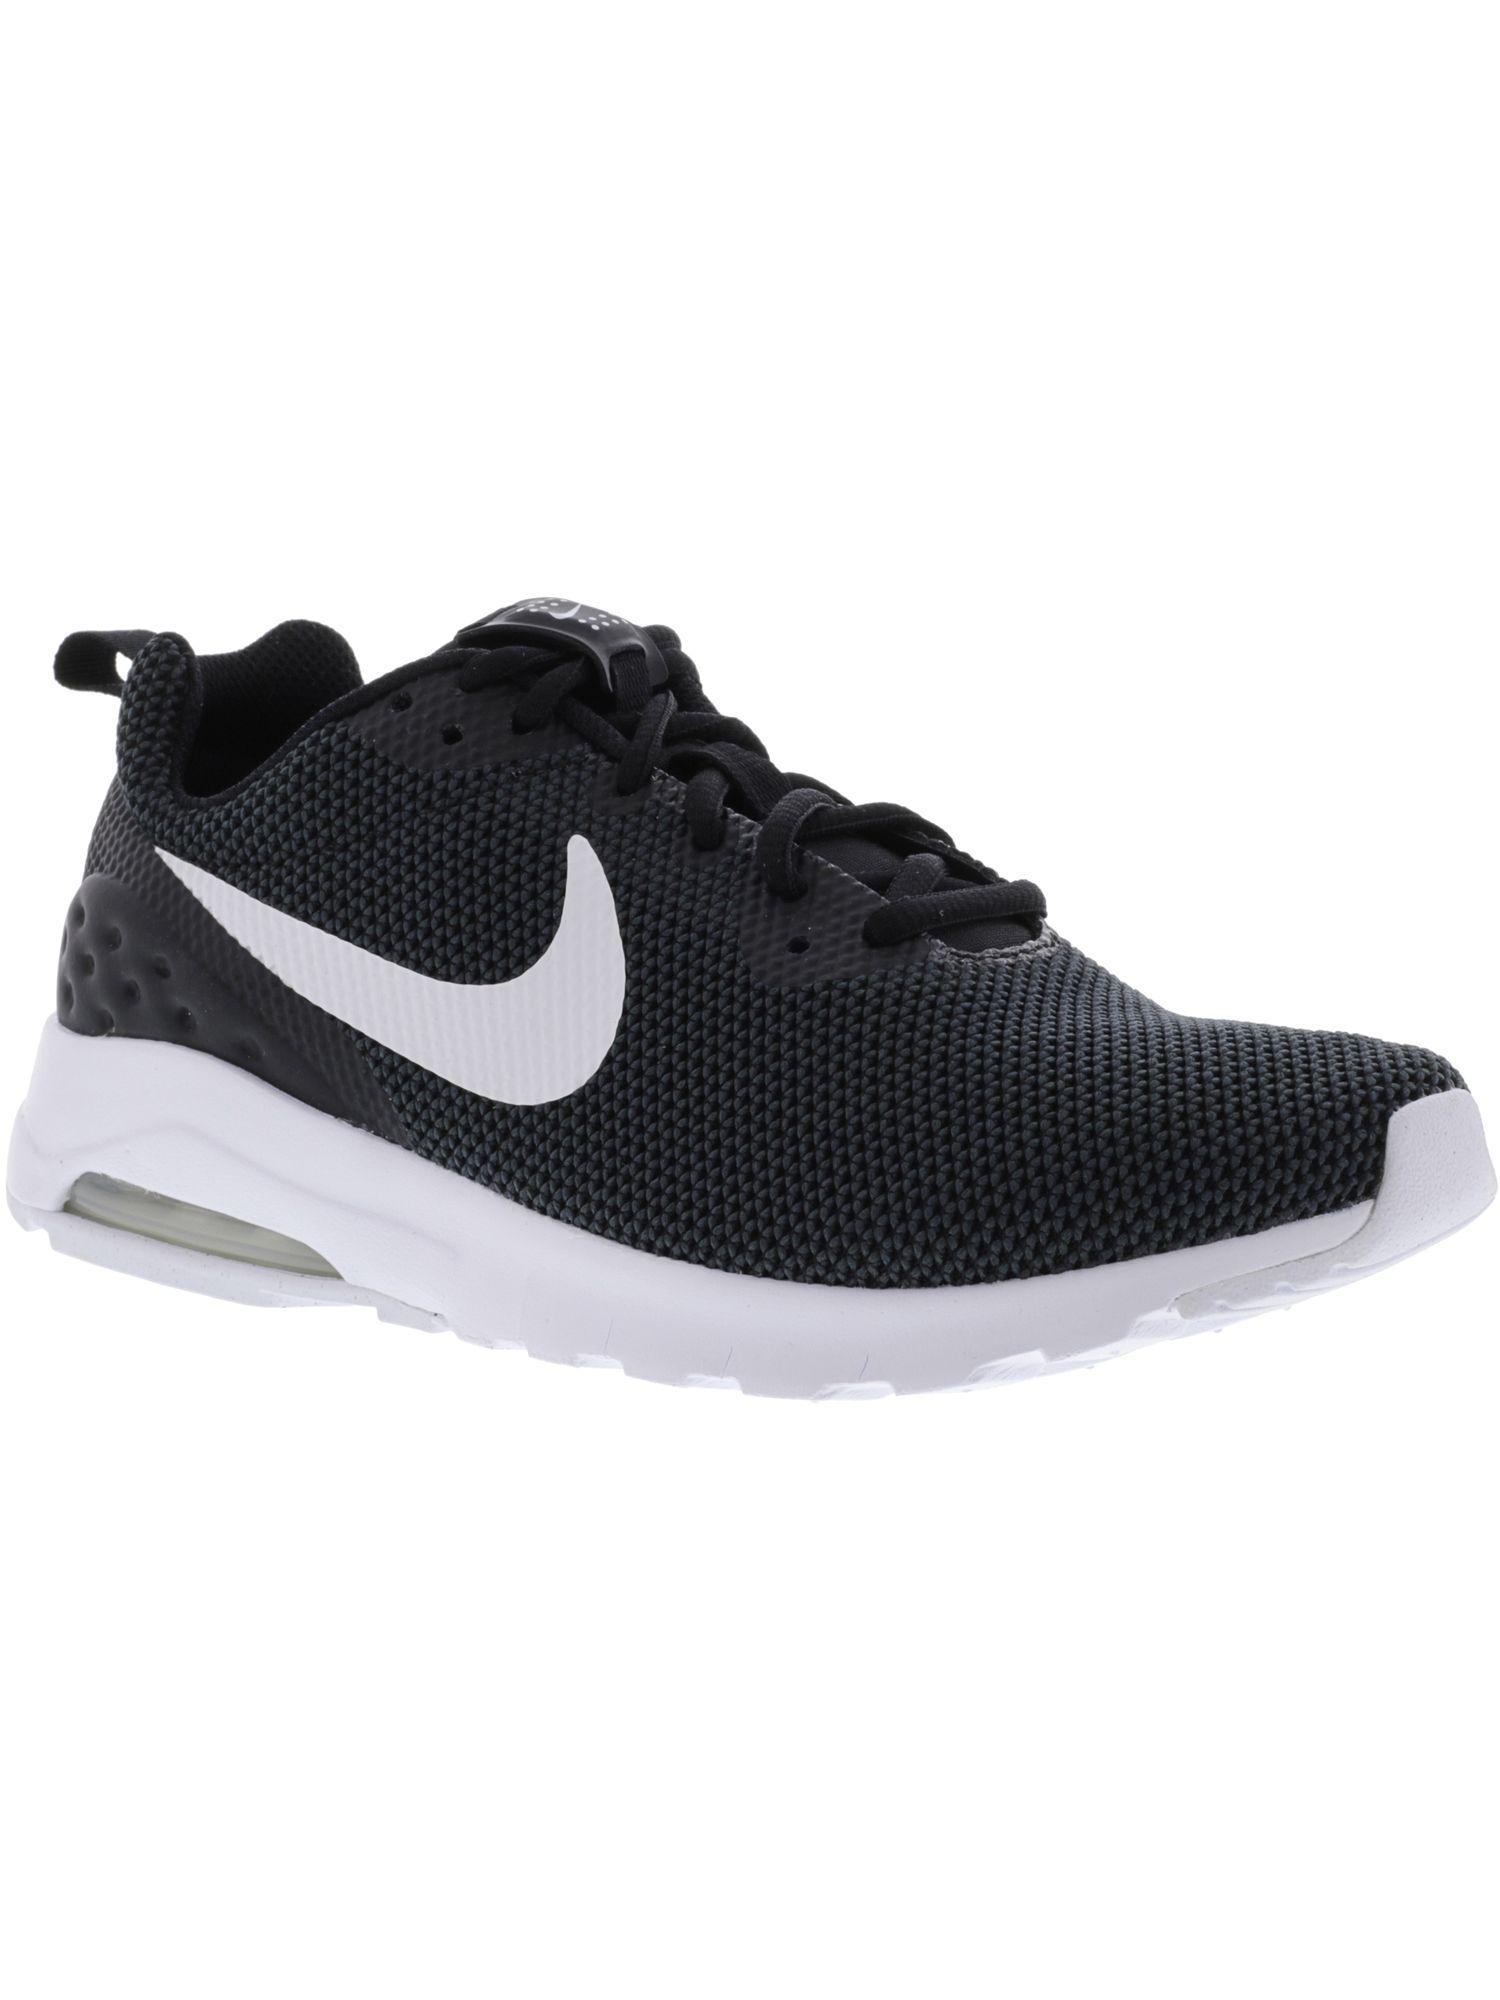 e10c64a3fd13 Nike - Women s Air Max Motion Lw Se Black   White - Anthracite Ankle-high.  View fullscreen